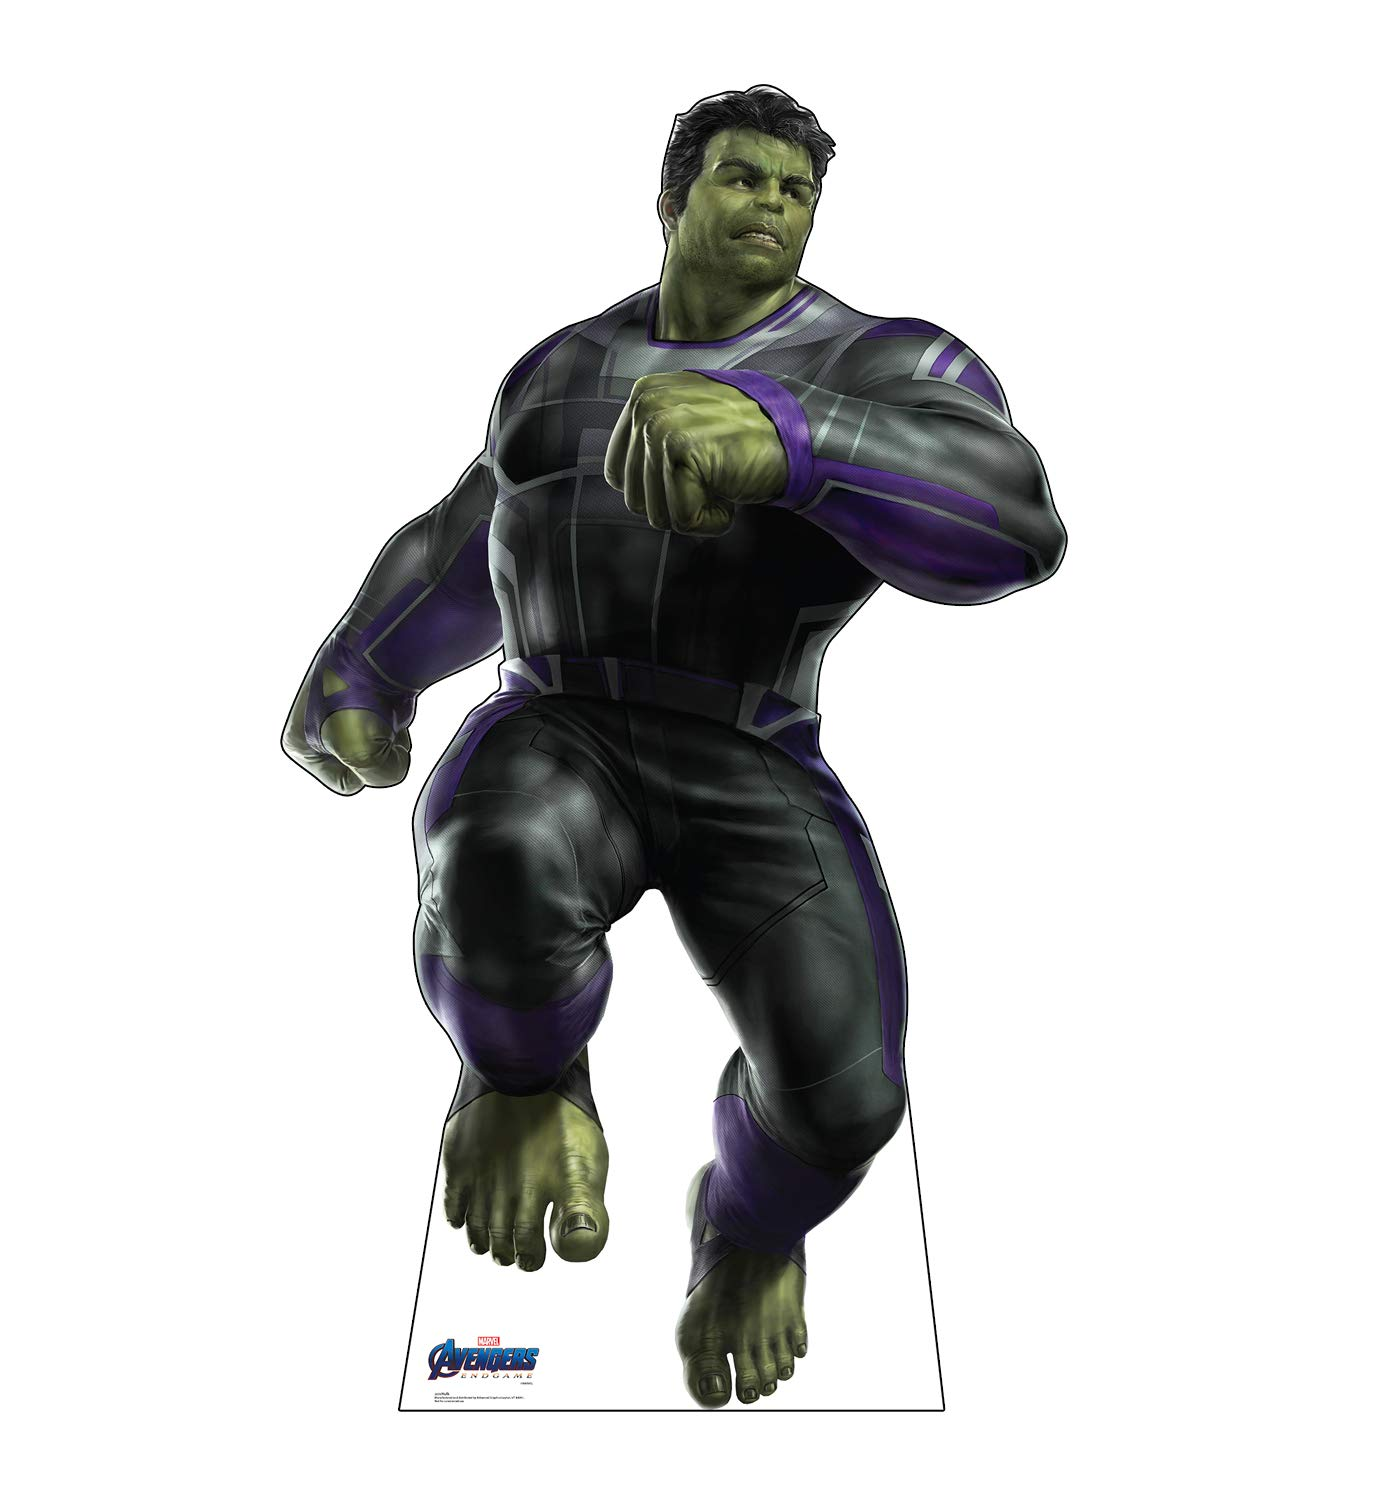 Advanced Graphics Hulk Life Size Cardboard Cutout Standup - Marvel's Avengers: Endgame (2019 Film)